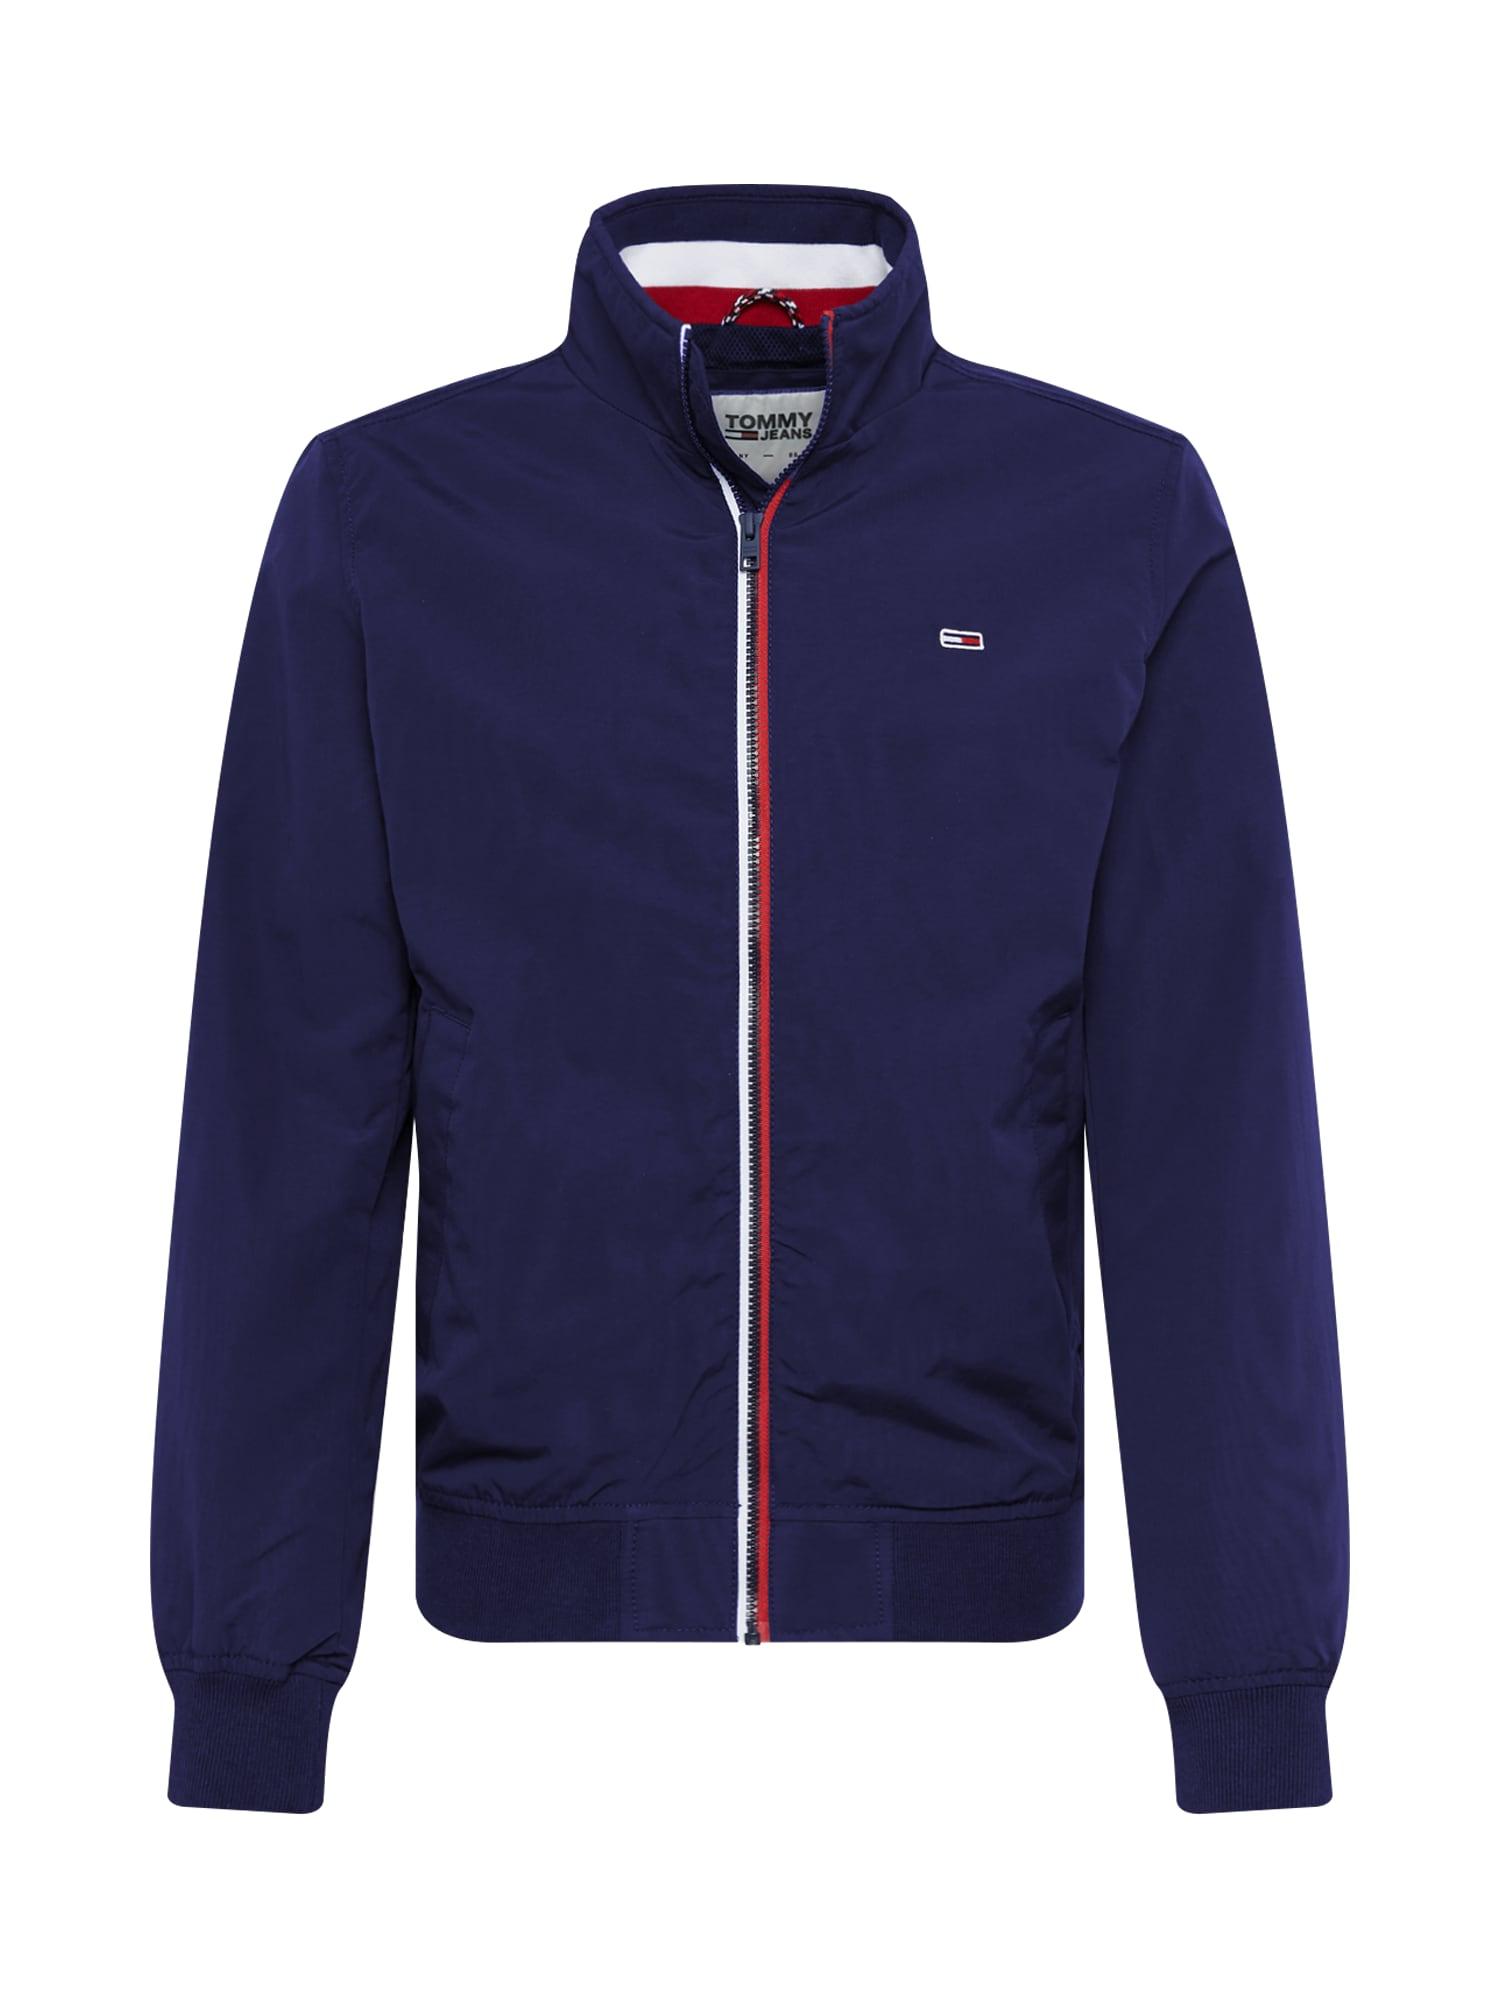 Tommy Jeans Žieminė striukė 'ESSENTIAL' balta / raudona / tamsiai mėlyna